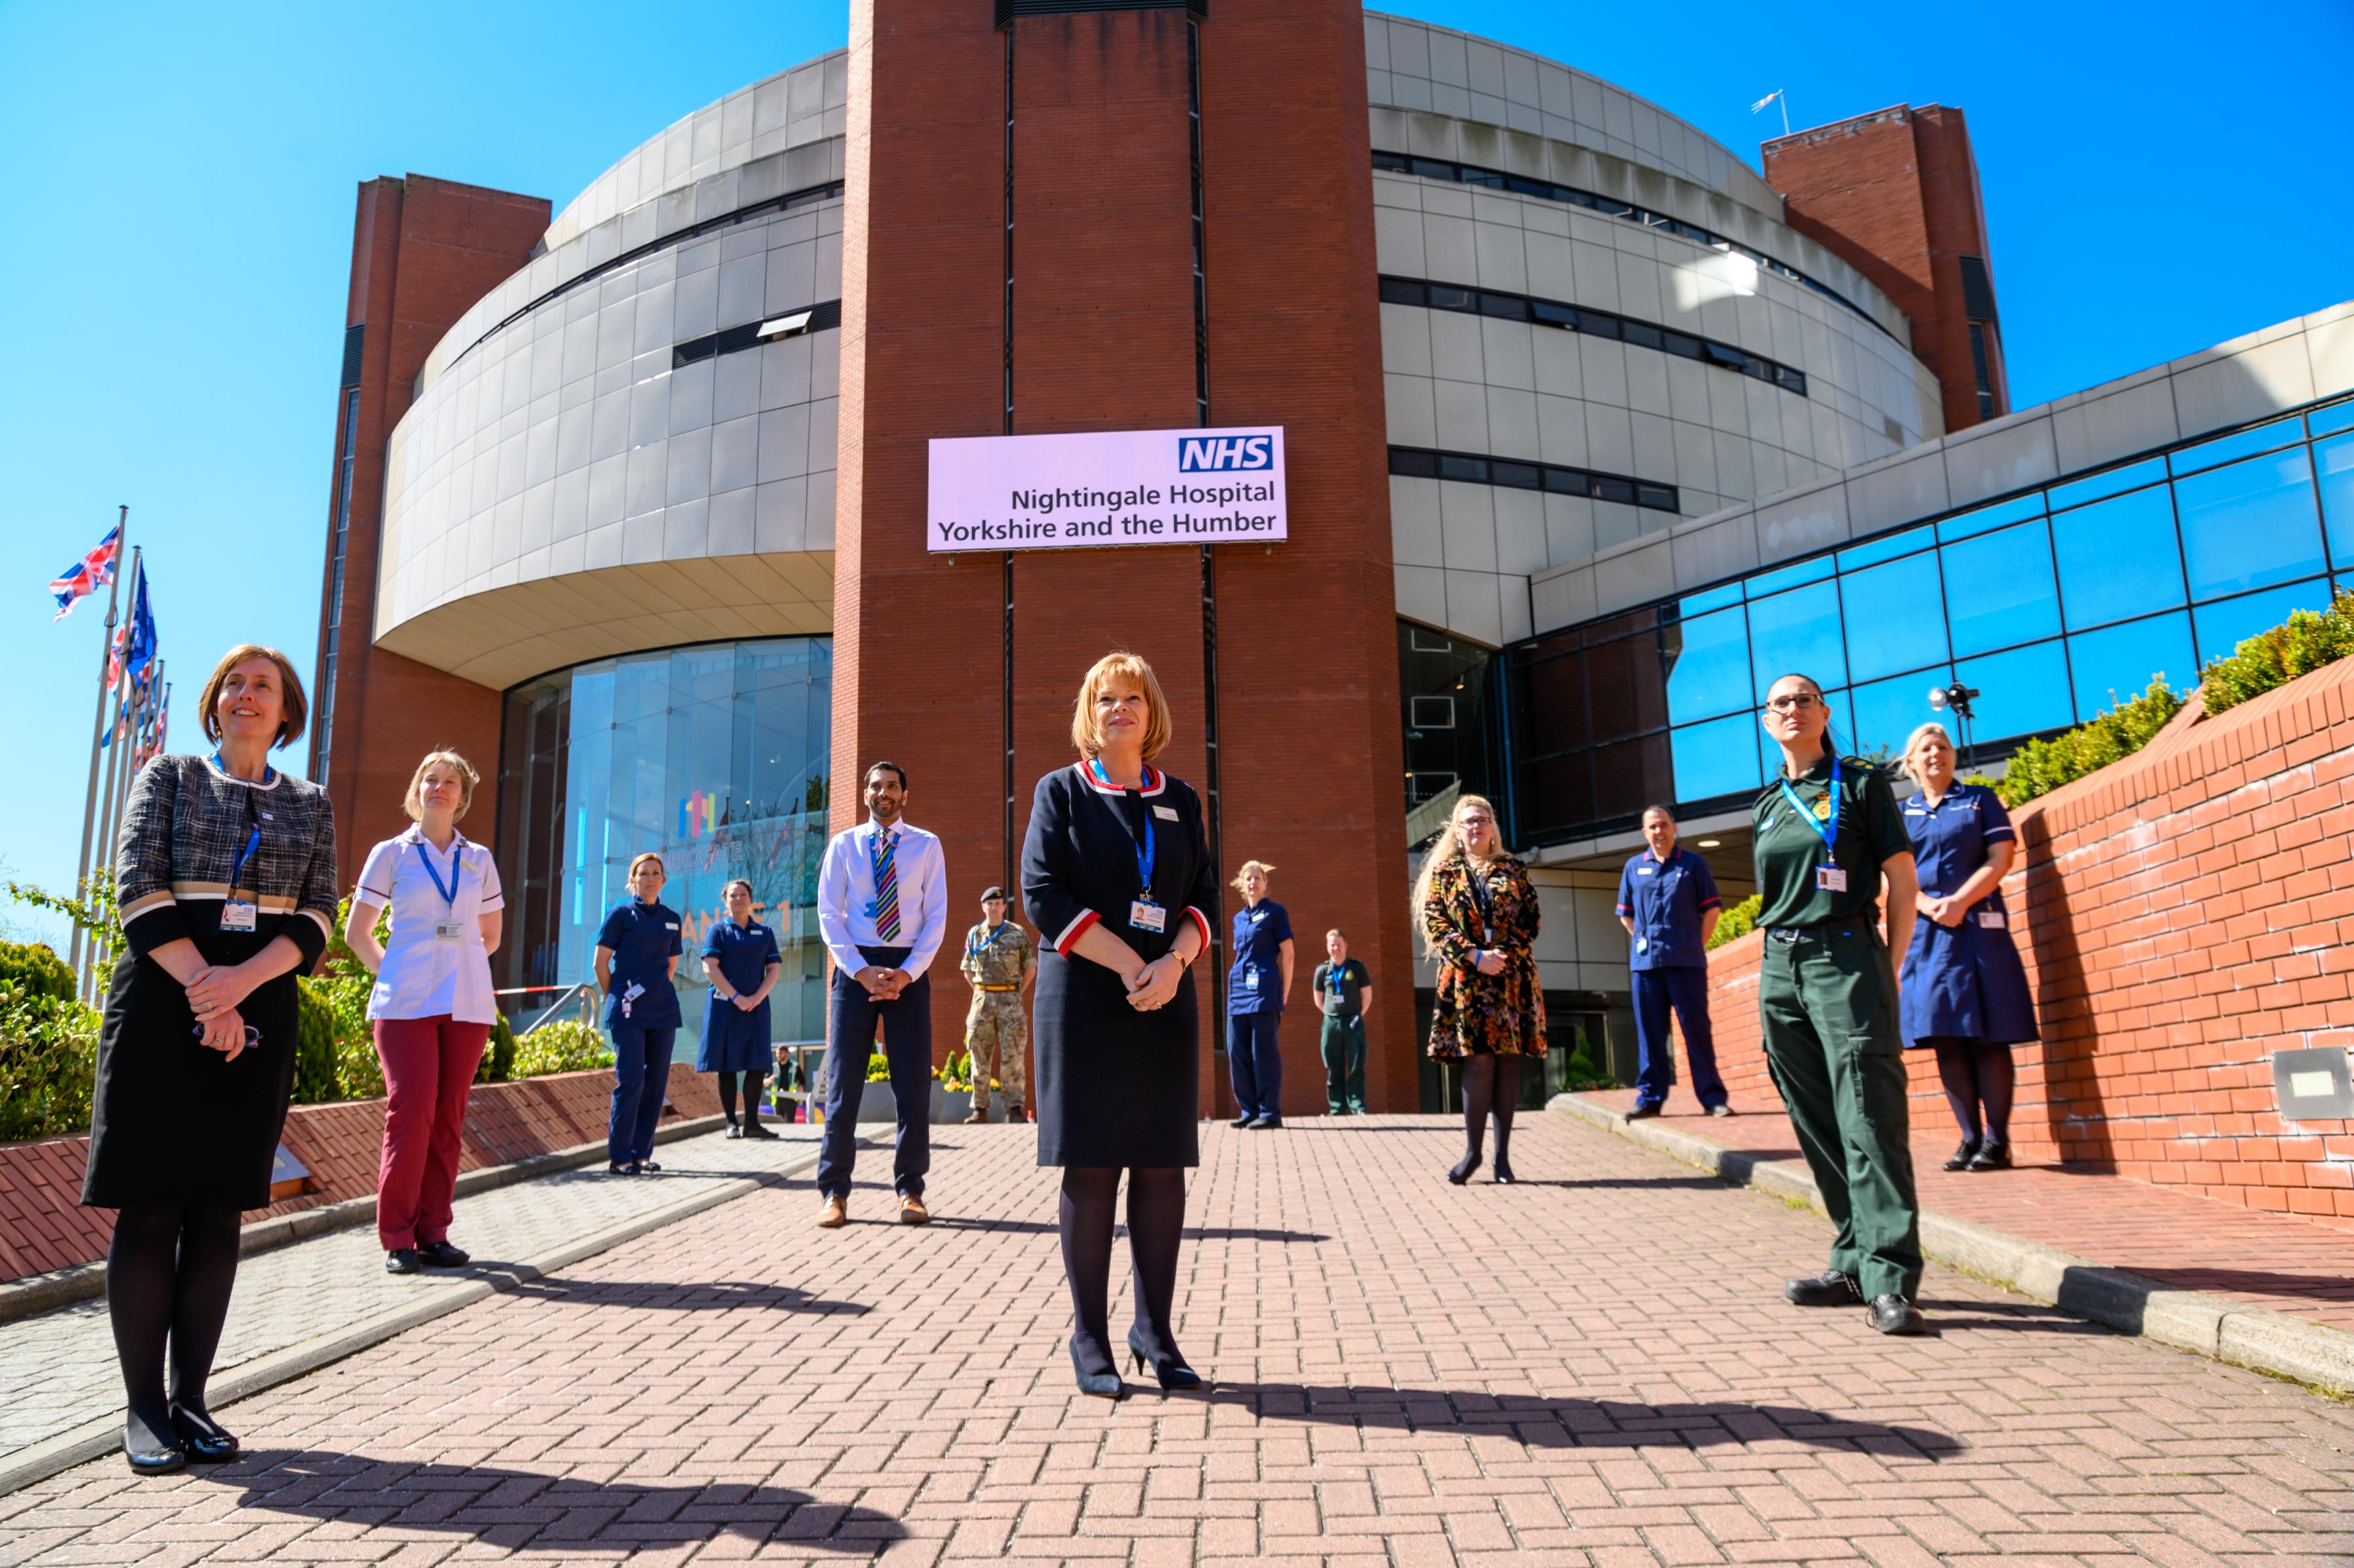 Captain Tom Moore to open new NHS Nightingale coronavirus hospital in Harrogate